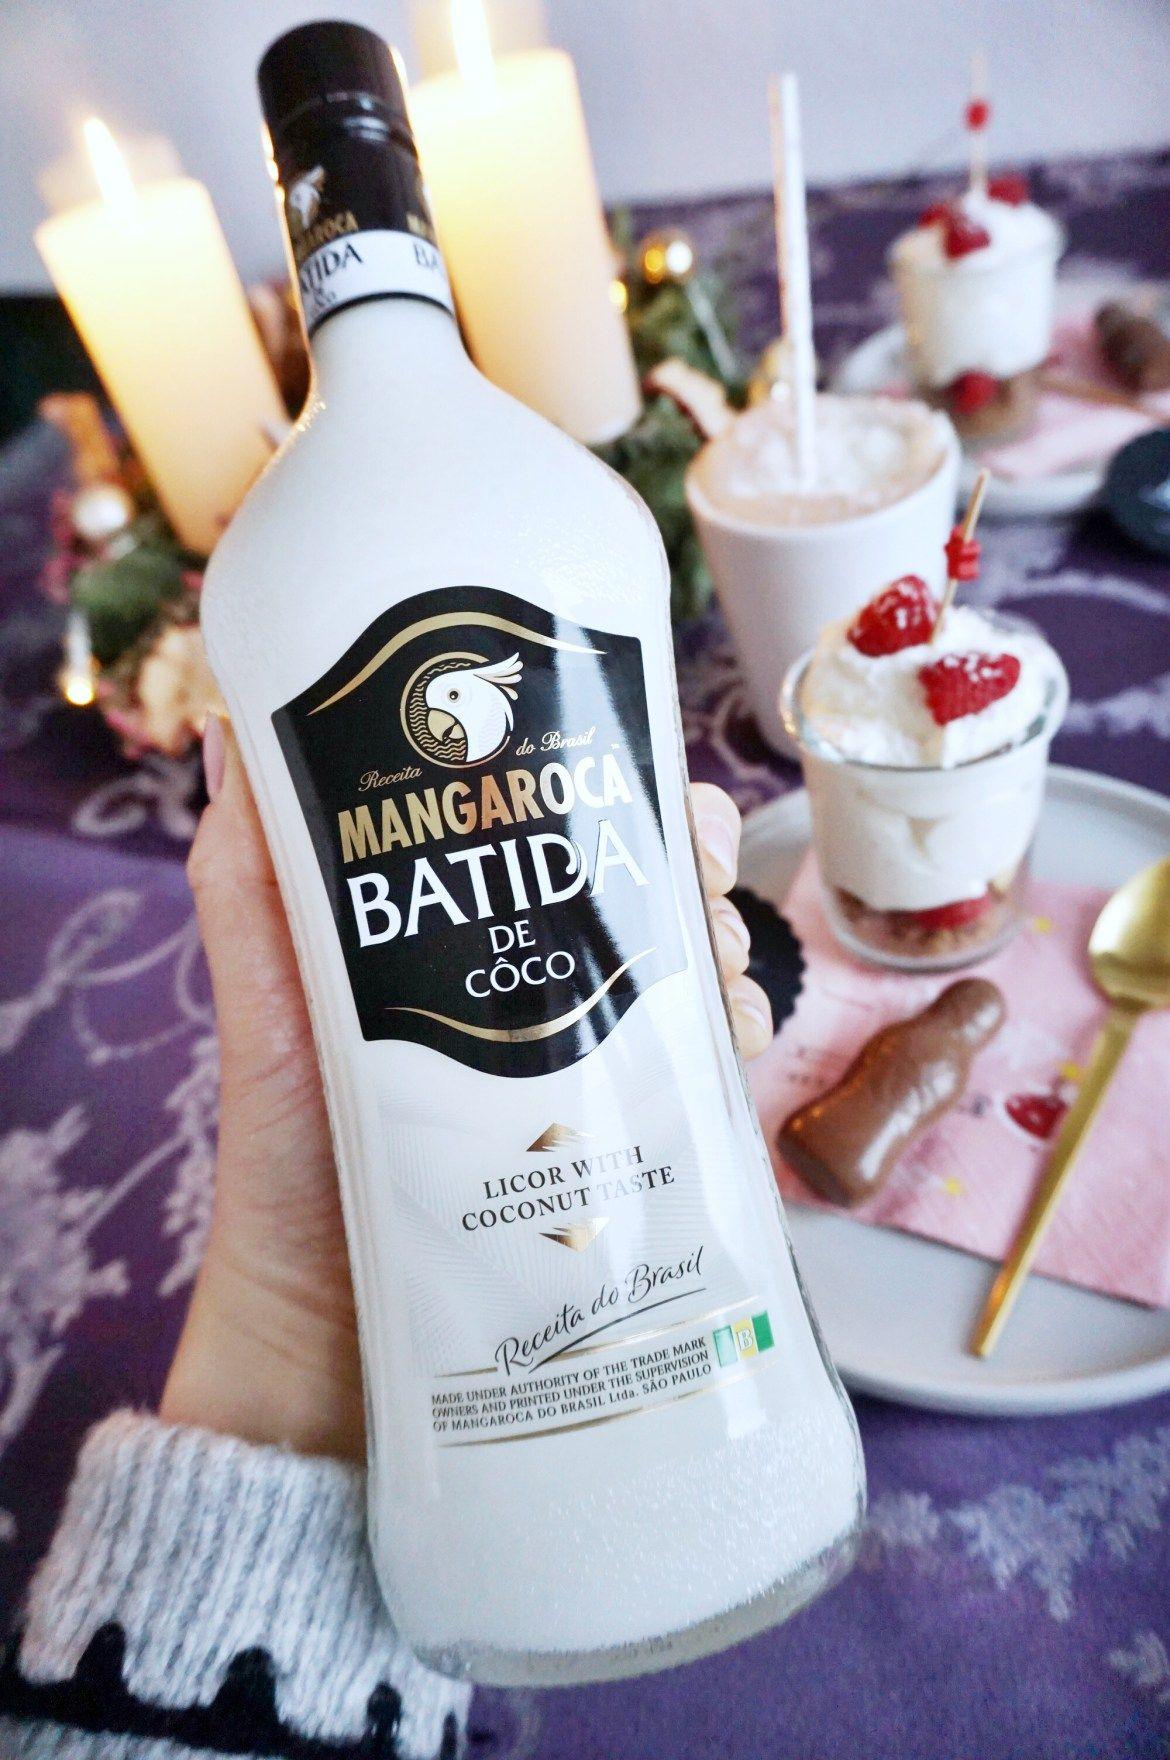 fb05e2d2078be2bfc68281fa0c8f95ff - Batida De Coco Rezepte